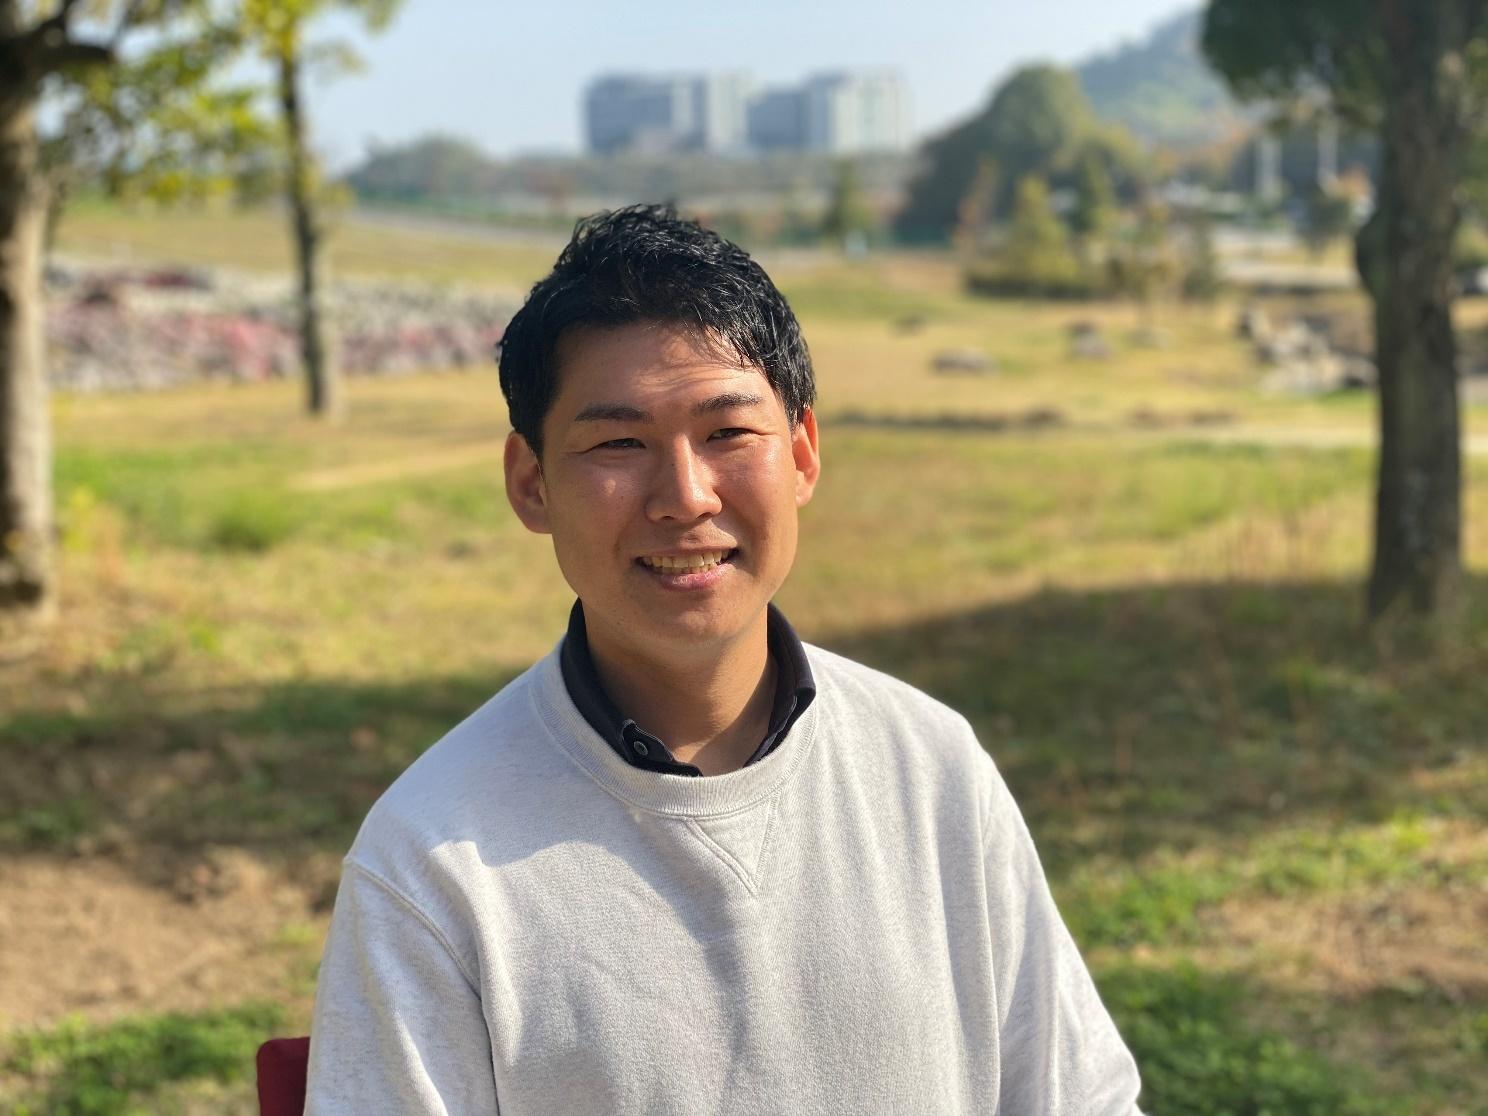 FC今治(株式会社今治.夢スポーツ)経営企画室長の中島啓太(なかじま けいた)様